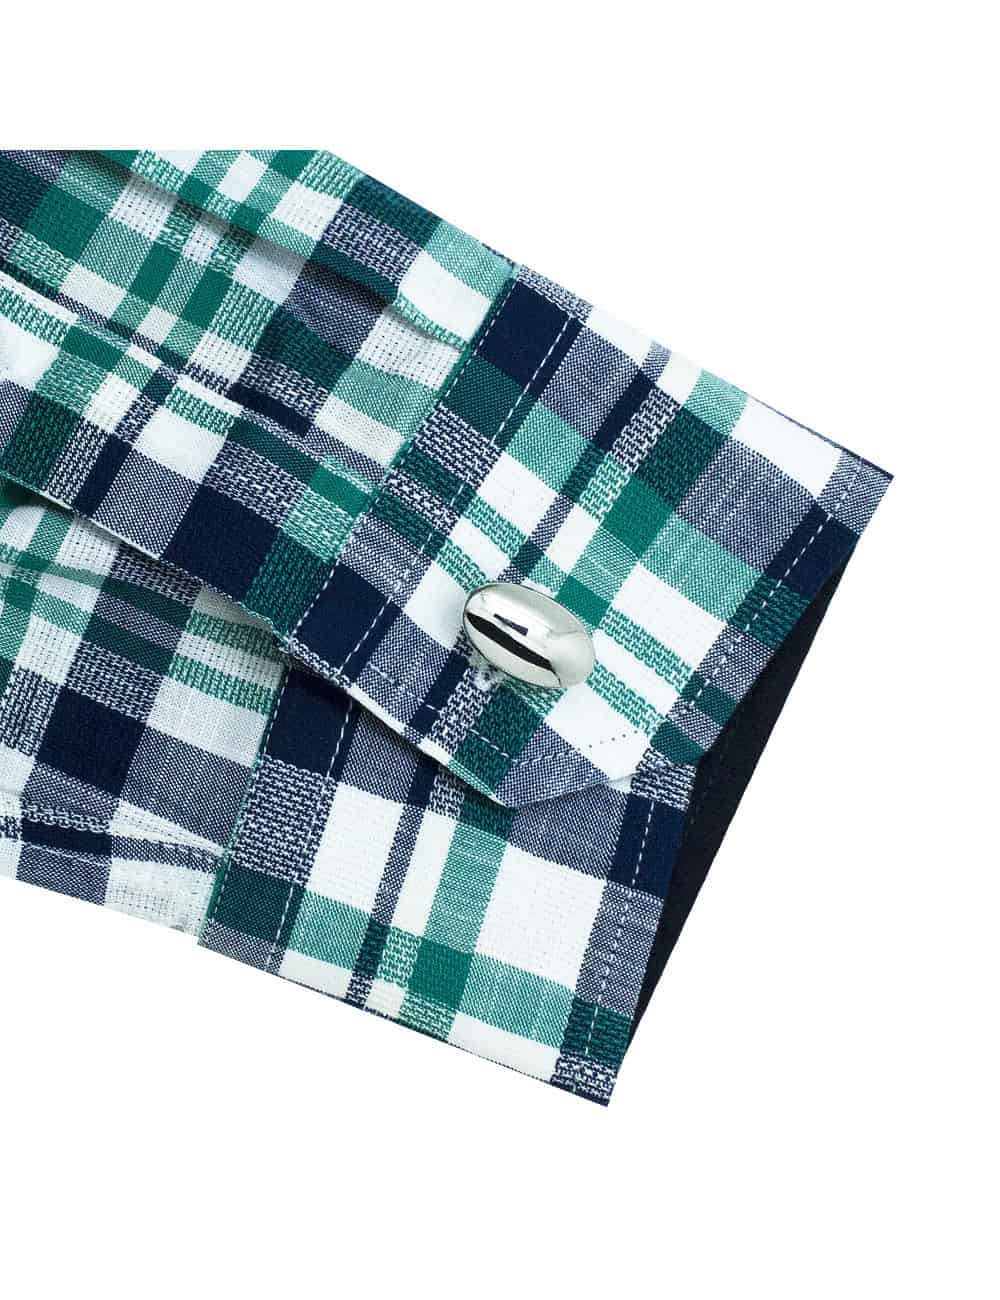 CF Navy and Green Checks 100% Premium Cotton Long Sleeve Single Cuff Shirt CF1A19.6